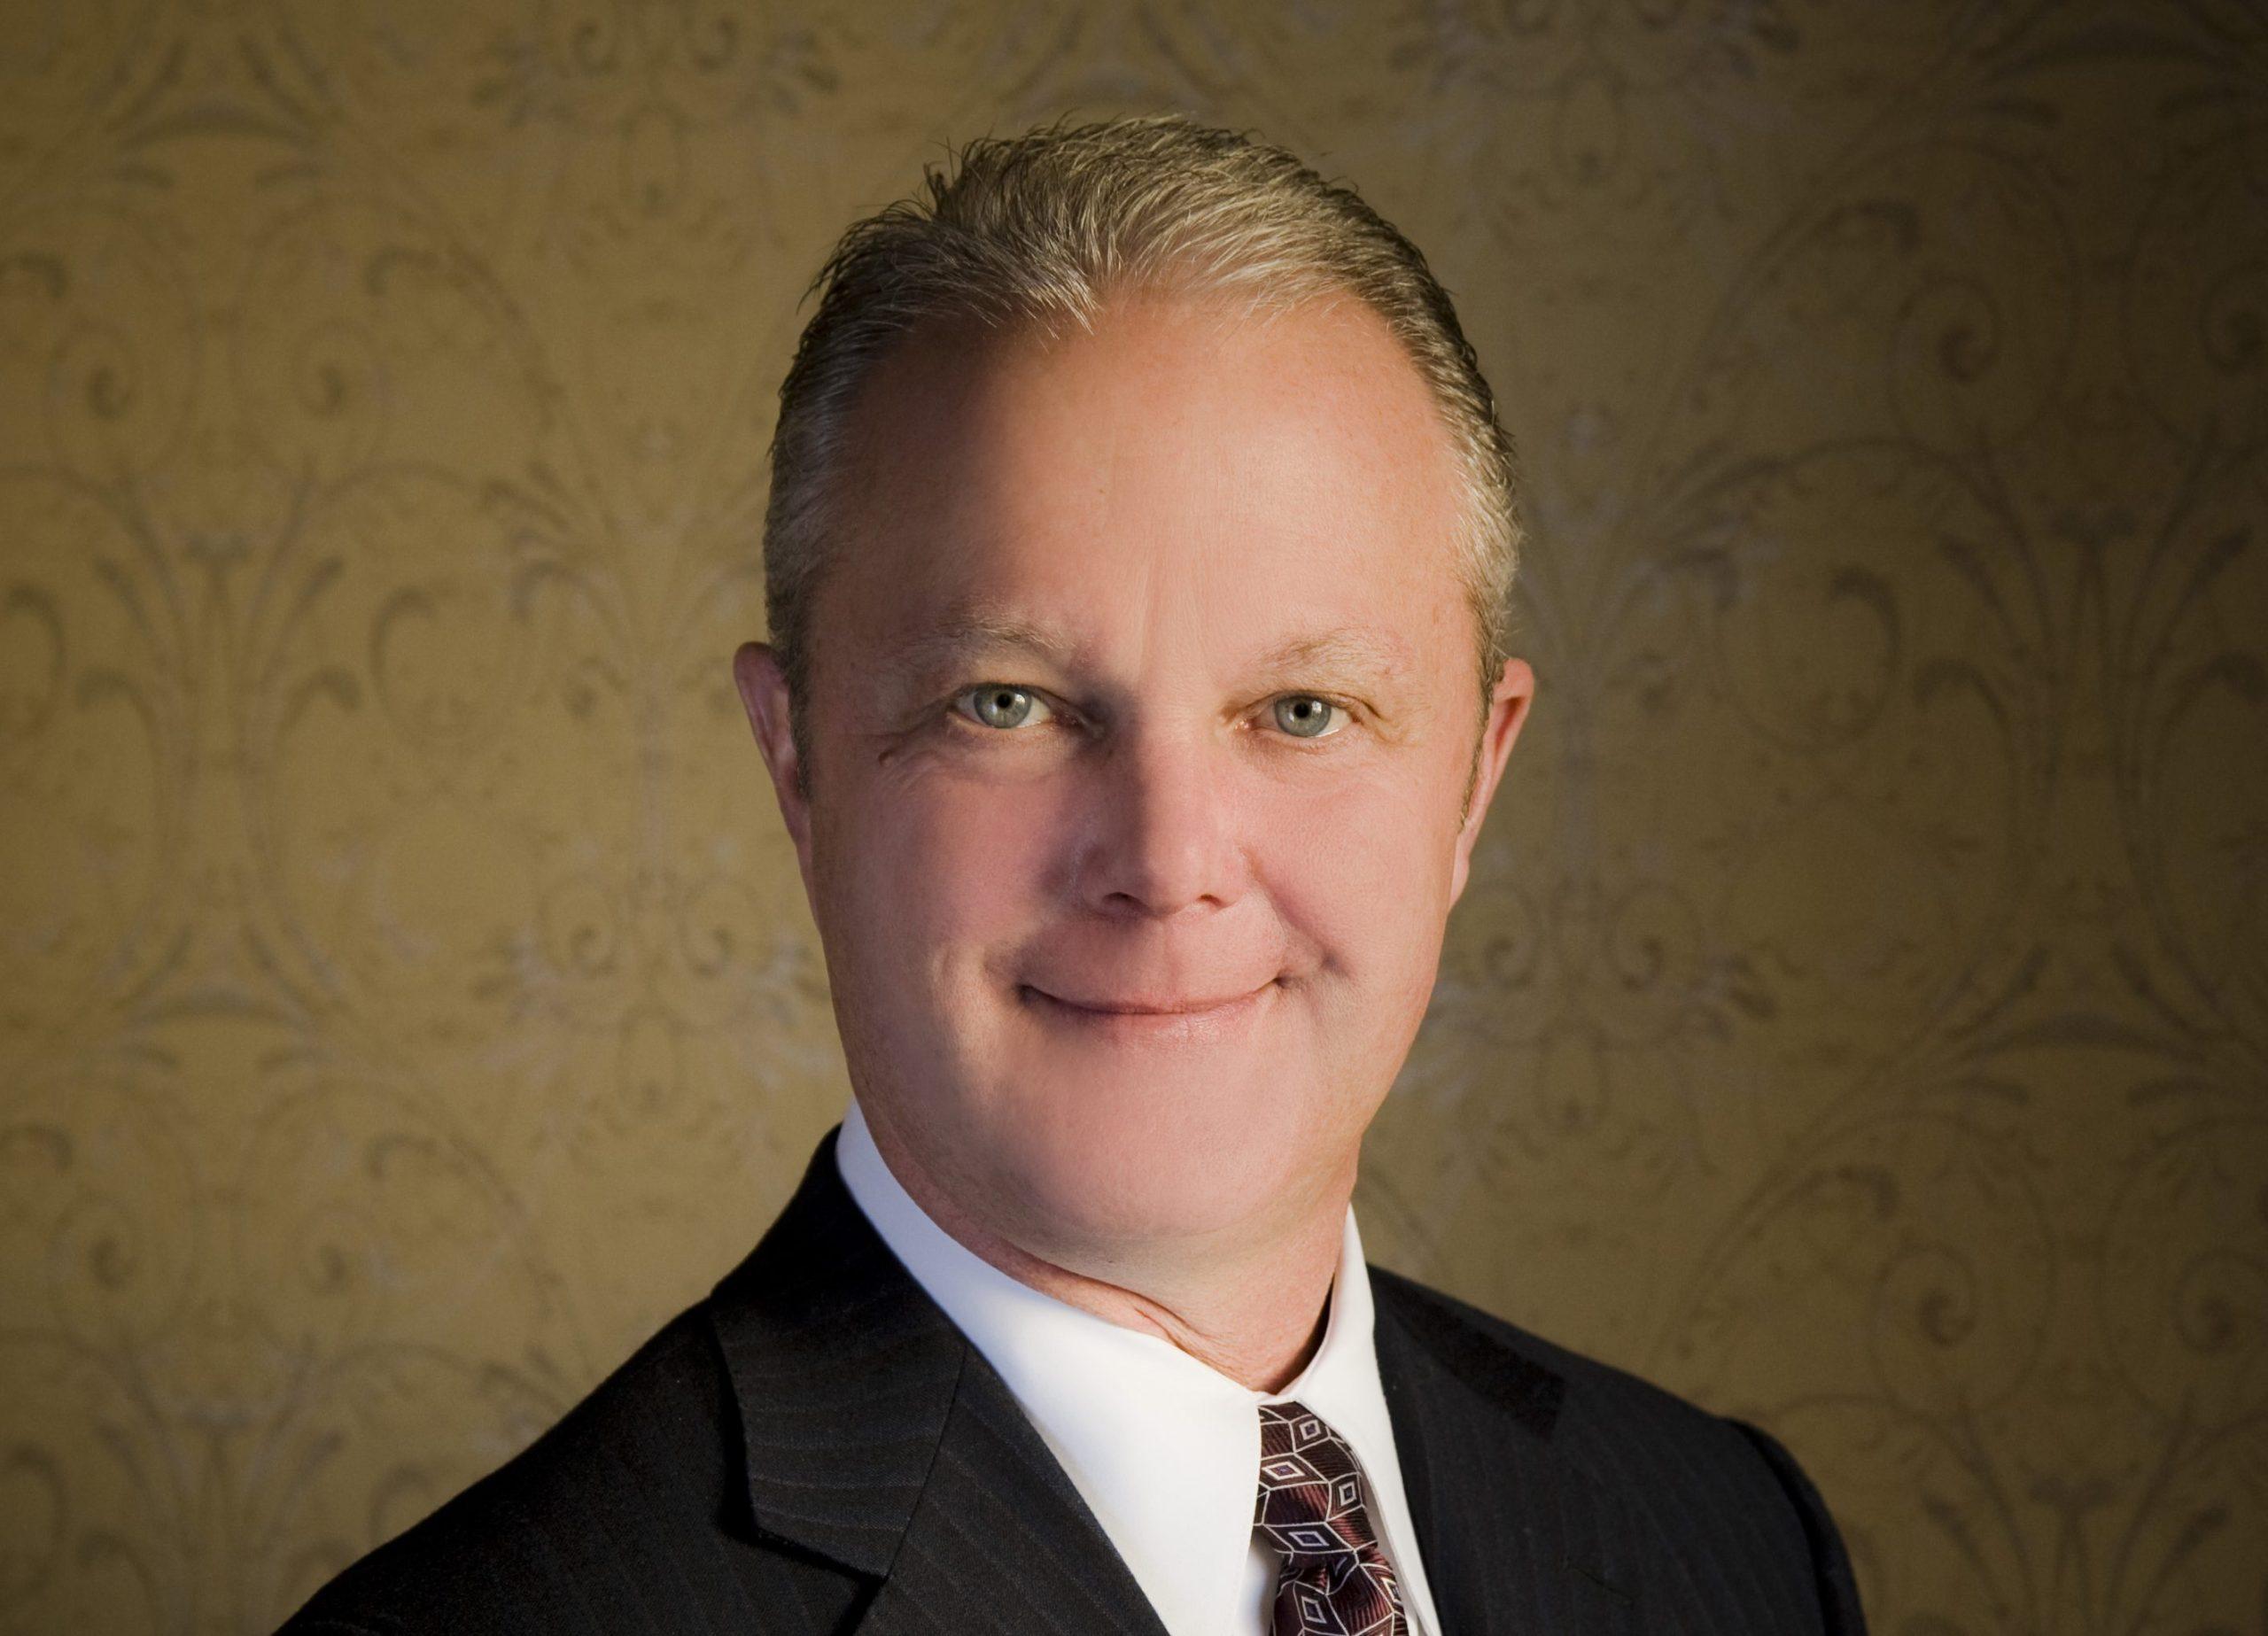 Esteemed Former Judge Named New Lamb McErlane Partner